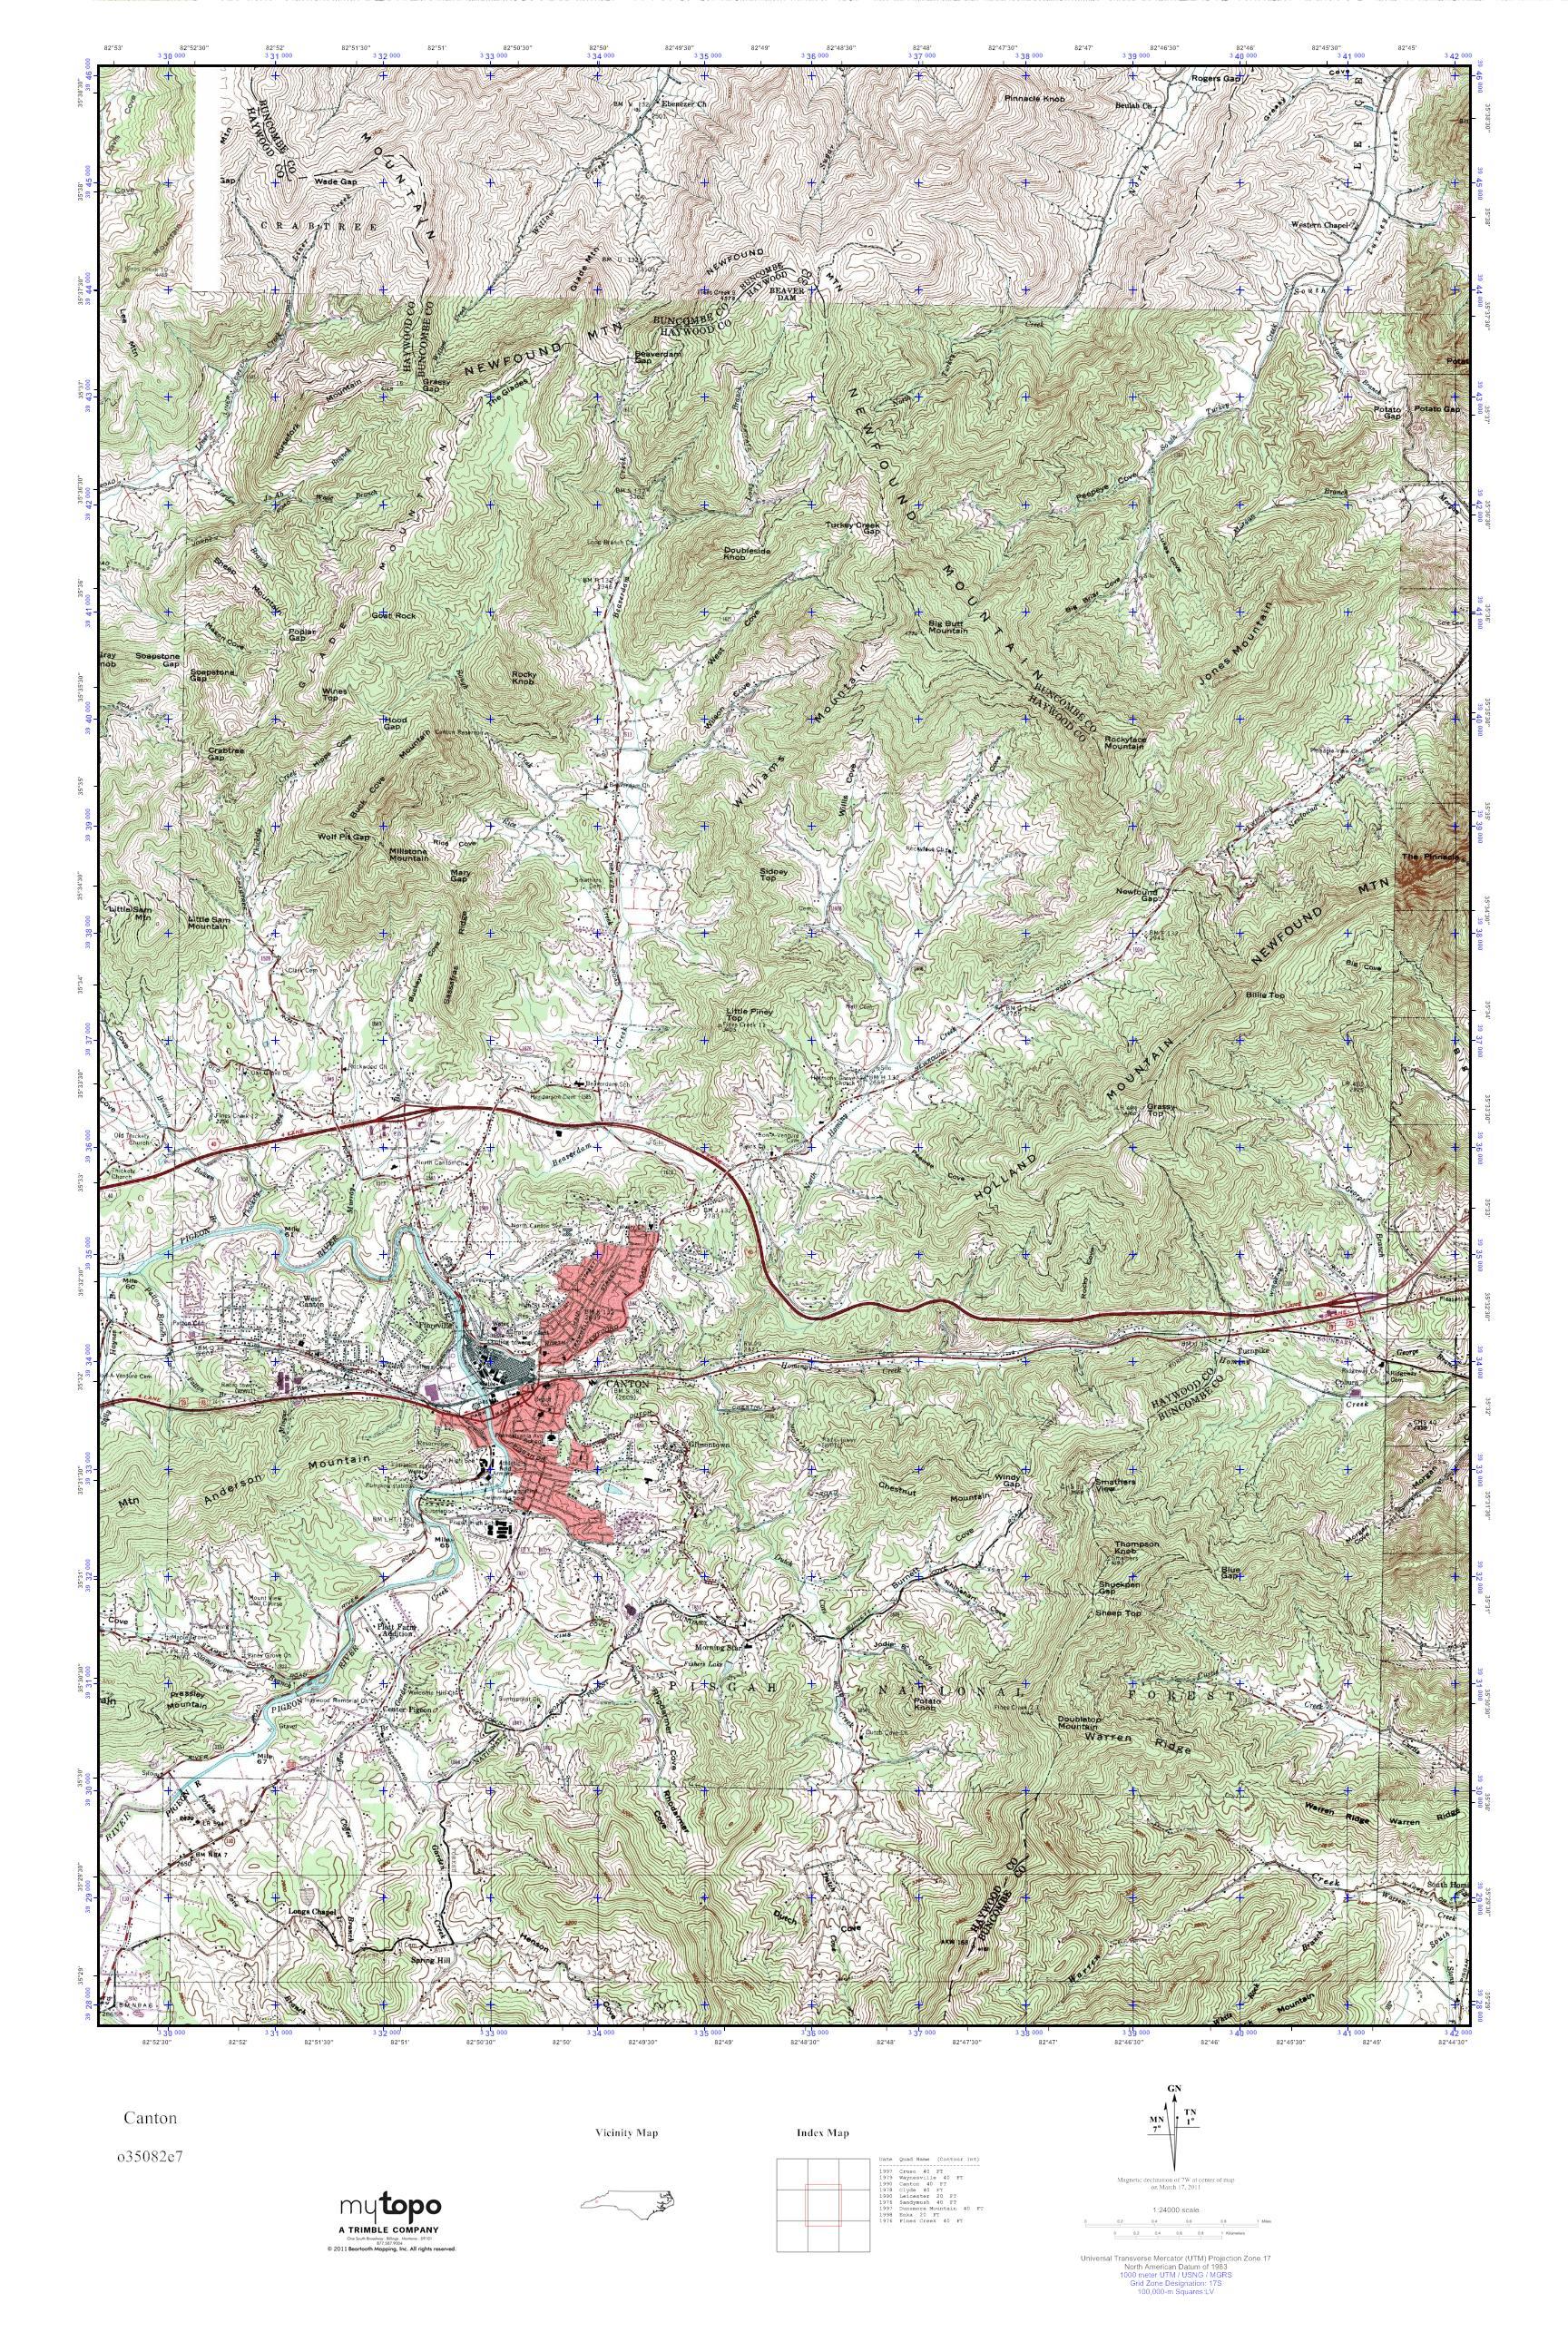 Mytopo Canton North Carolina Usgs Quad Topo Map